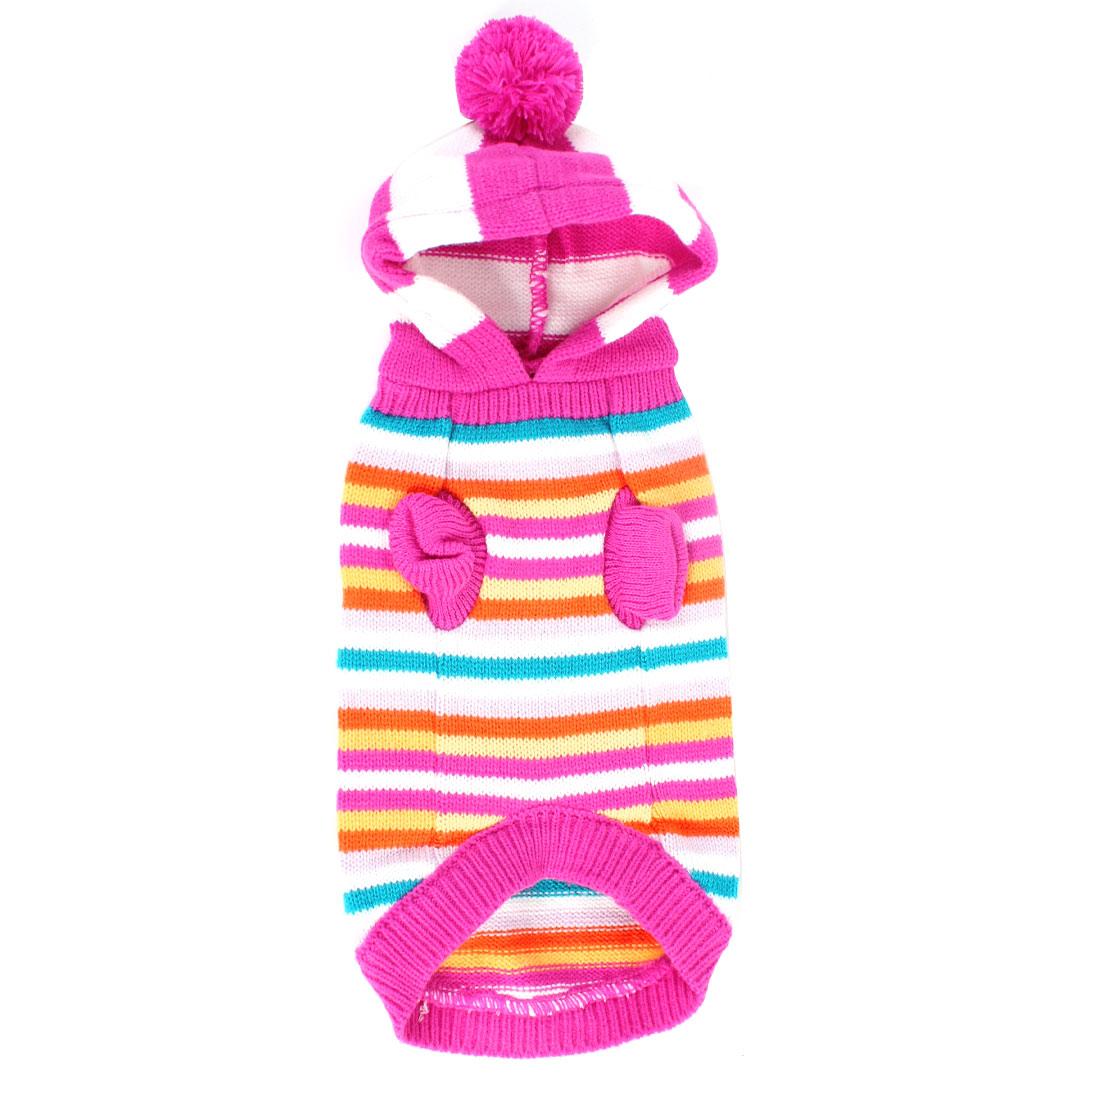 Pet Dog Stripe Pattern Hooded Warm Clothes Knitwear Sweater Multicolor Size XS